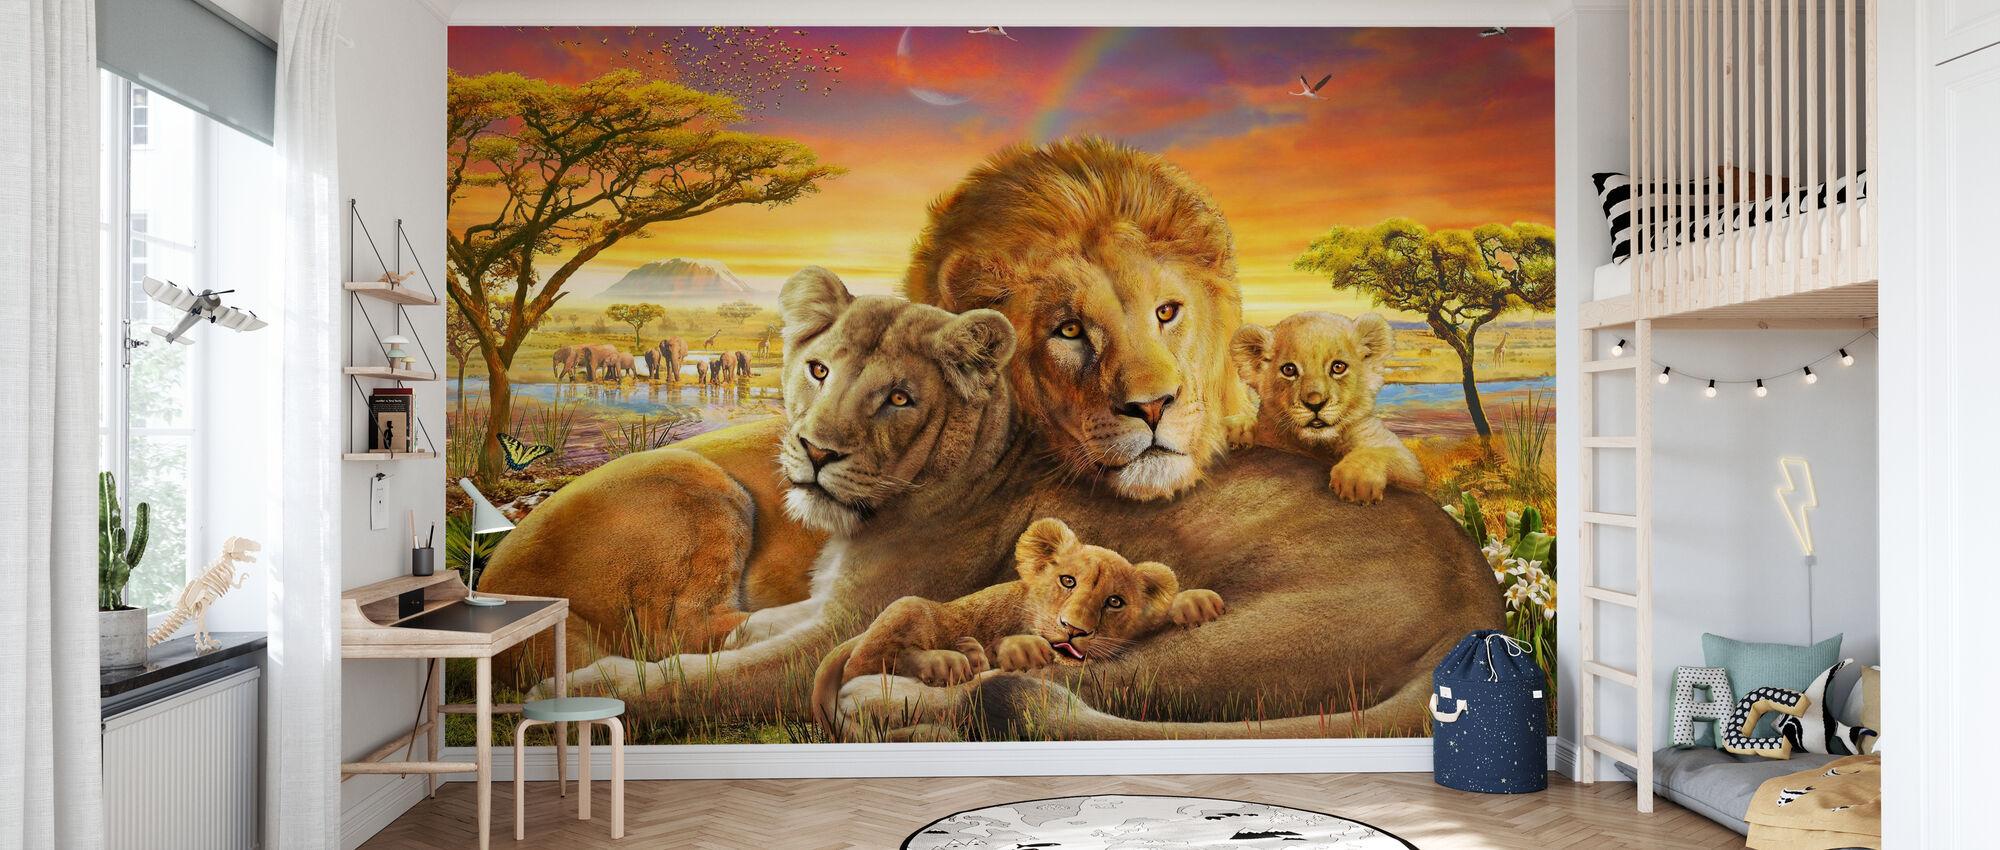 Kjærlig løver - Tapet - Barnerom